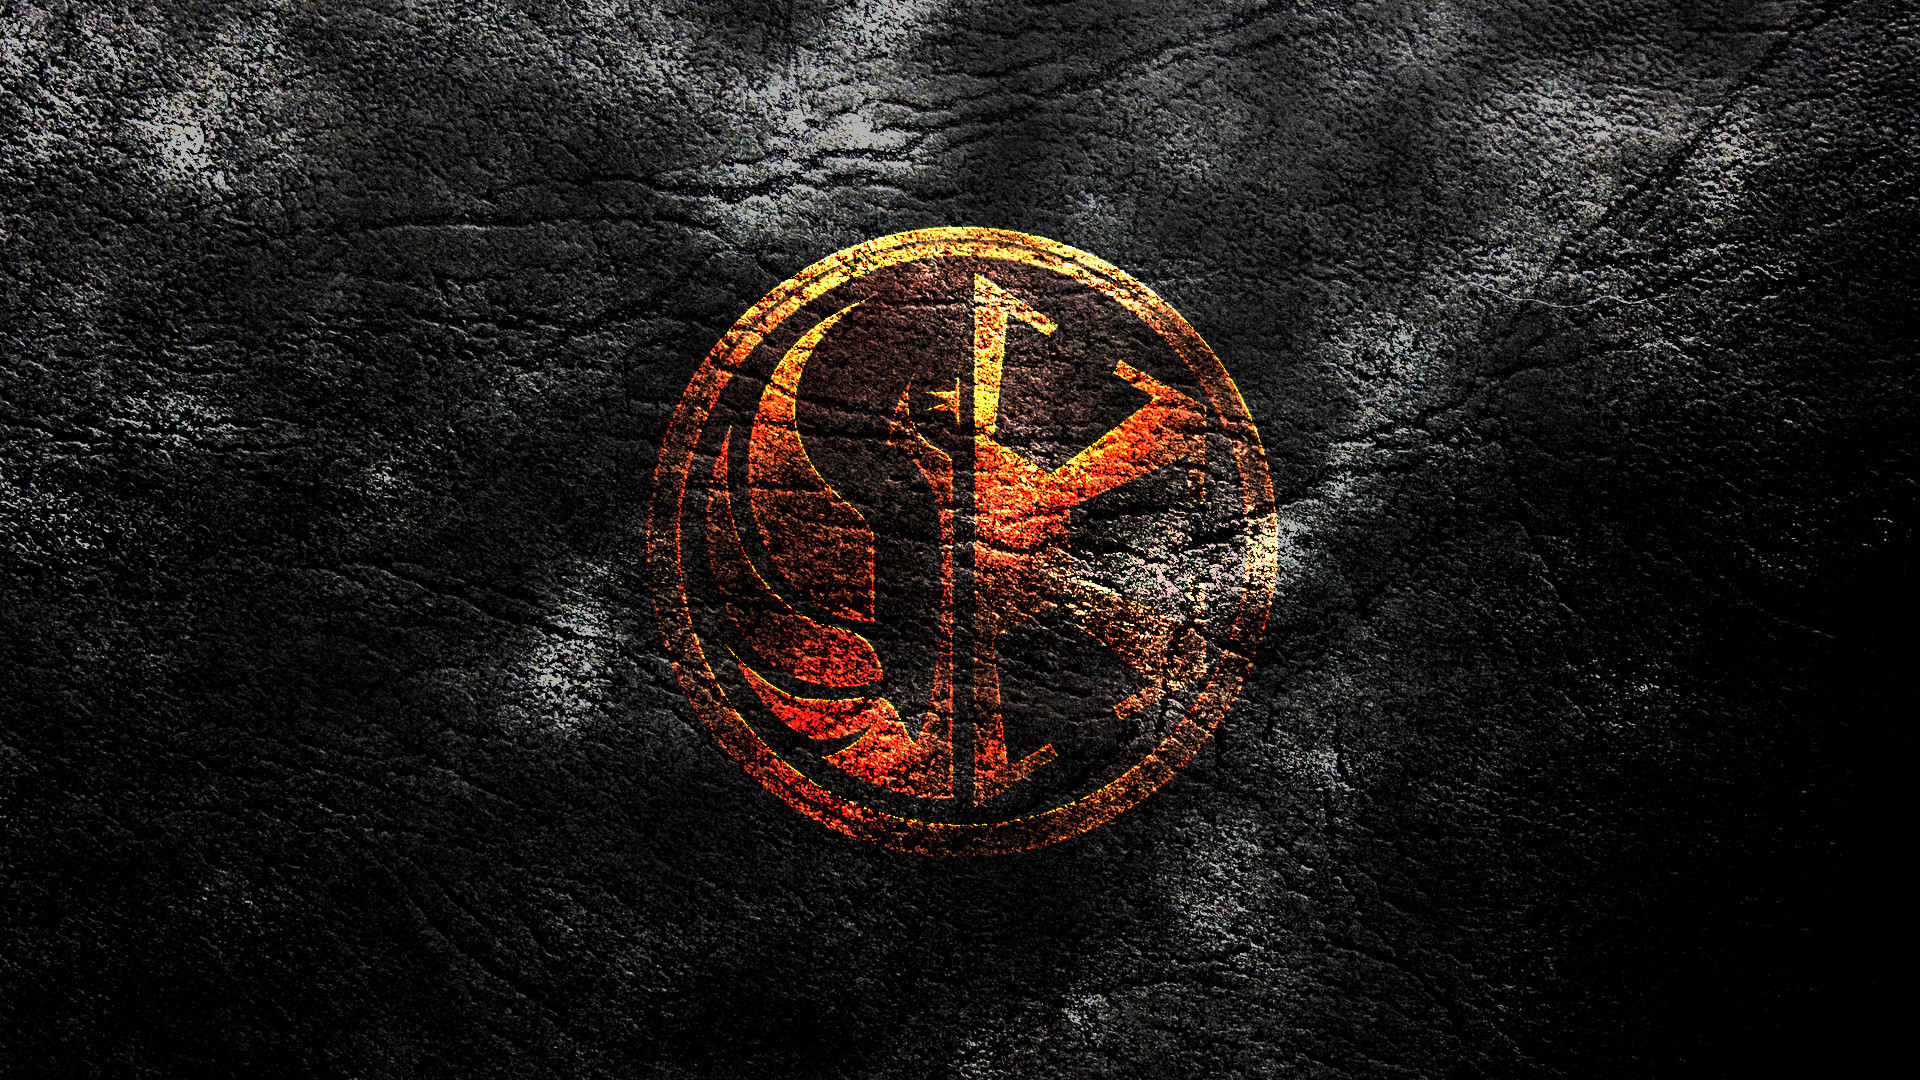 Swtor Logo